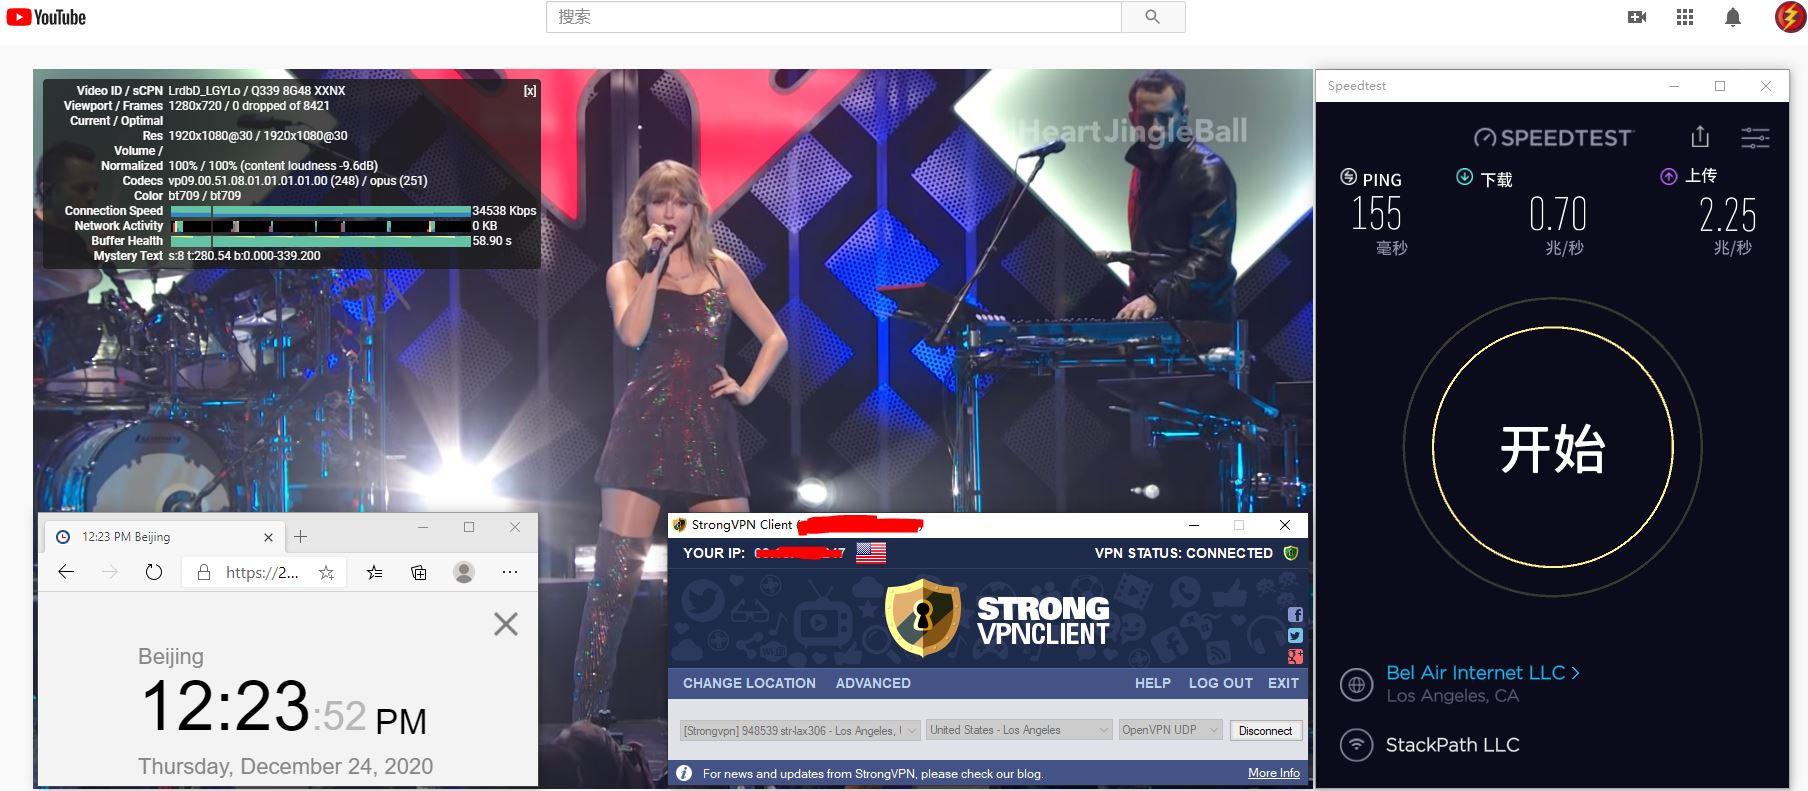 Windows10 StrongVPN USA - Los Angeles 服务器 中国VPN 翻墙 科学上网 测试 - 20201224